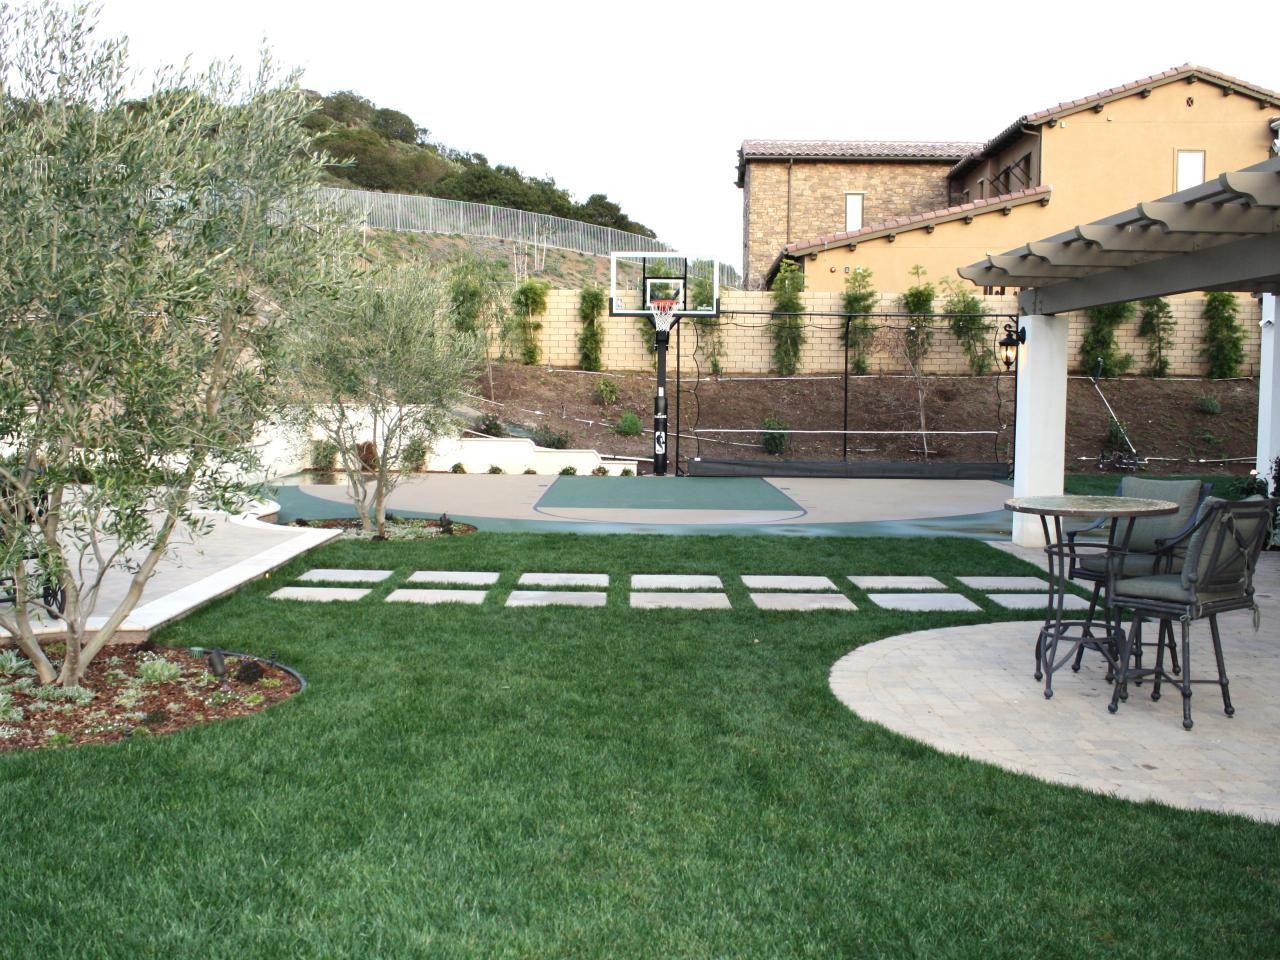 Pavers Connect Backyard Patios Outdoor Remodel Backyard Design Backyard Patio